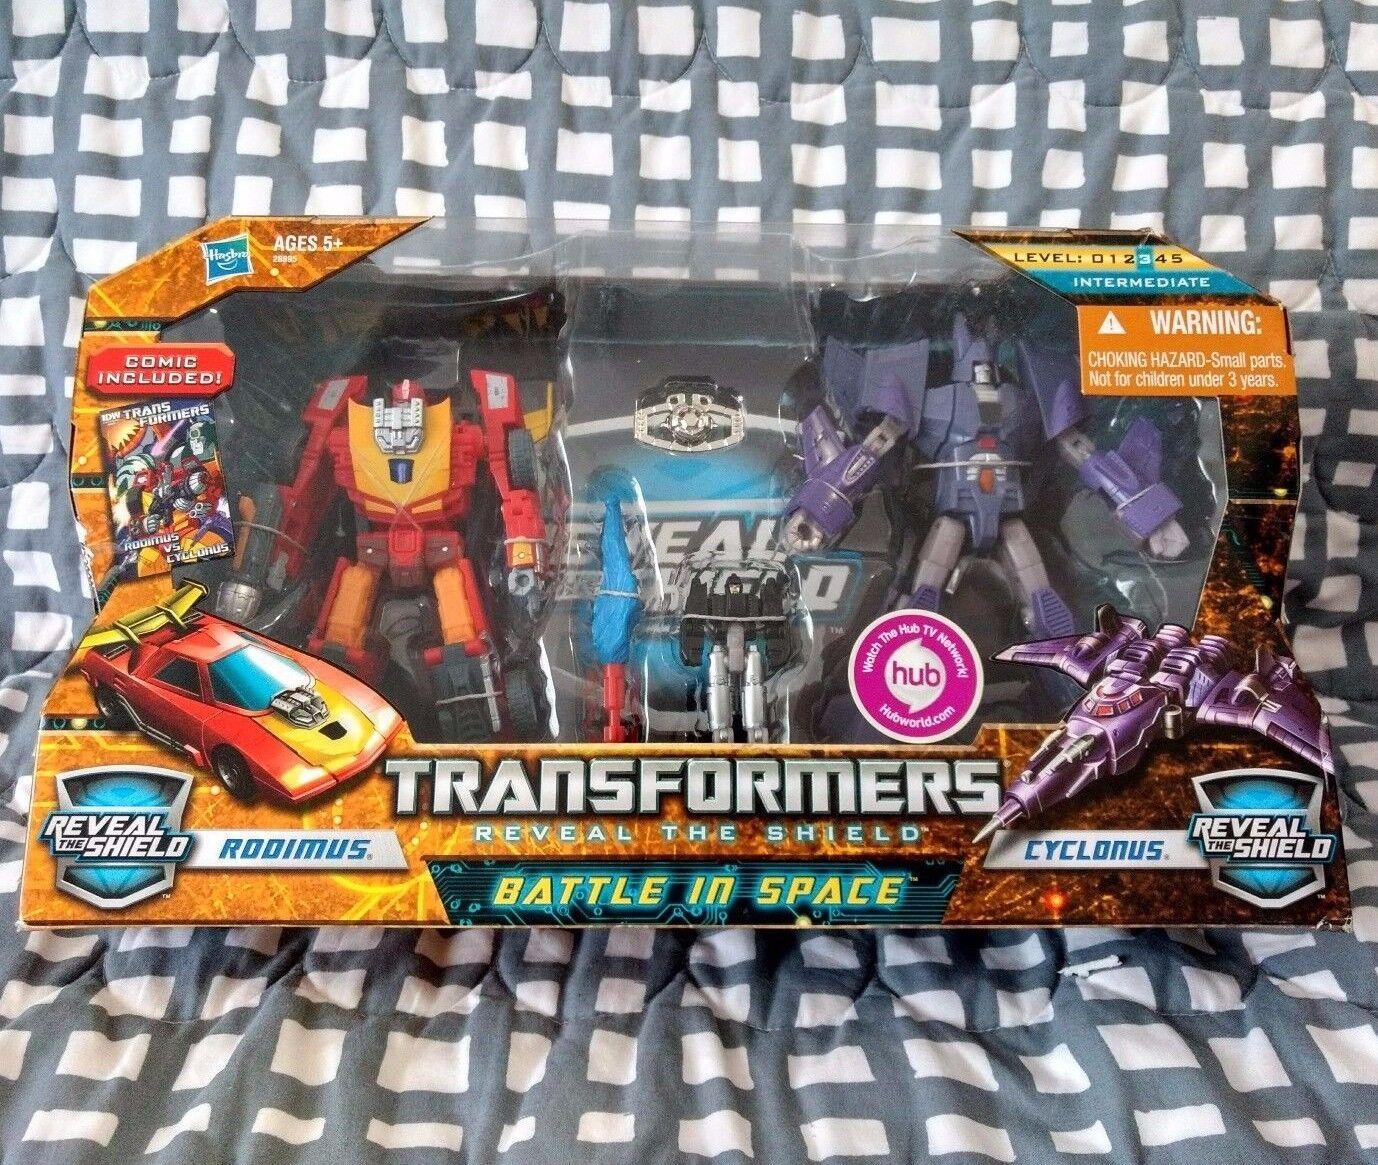 TransFormers Reveal The Shield Battle In Space Rodimus vs Cyclonus Matrix Lot G1